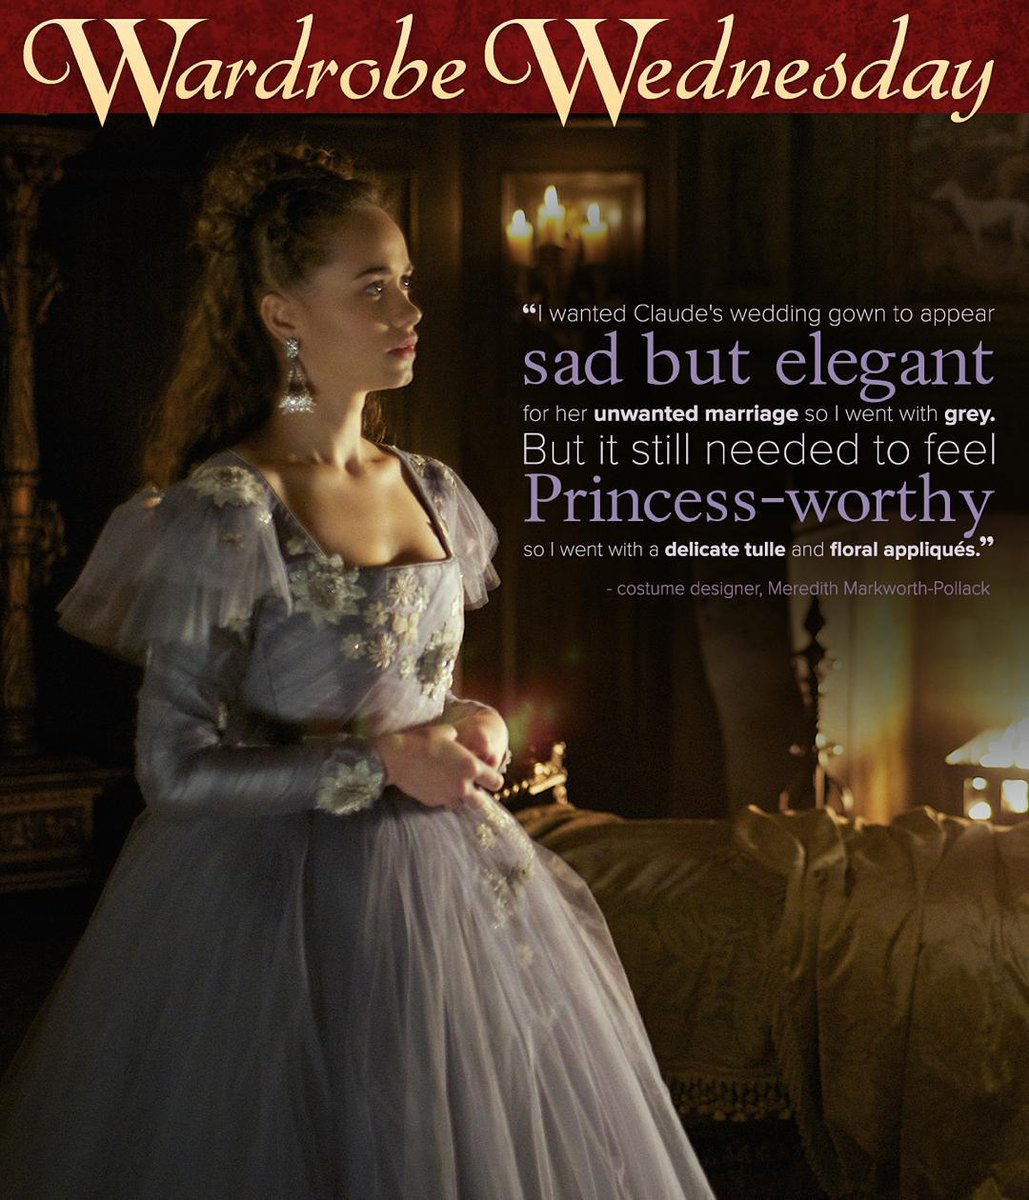 Morereign On Twitter Wardrobewednesday Claude S Wedding Dress